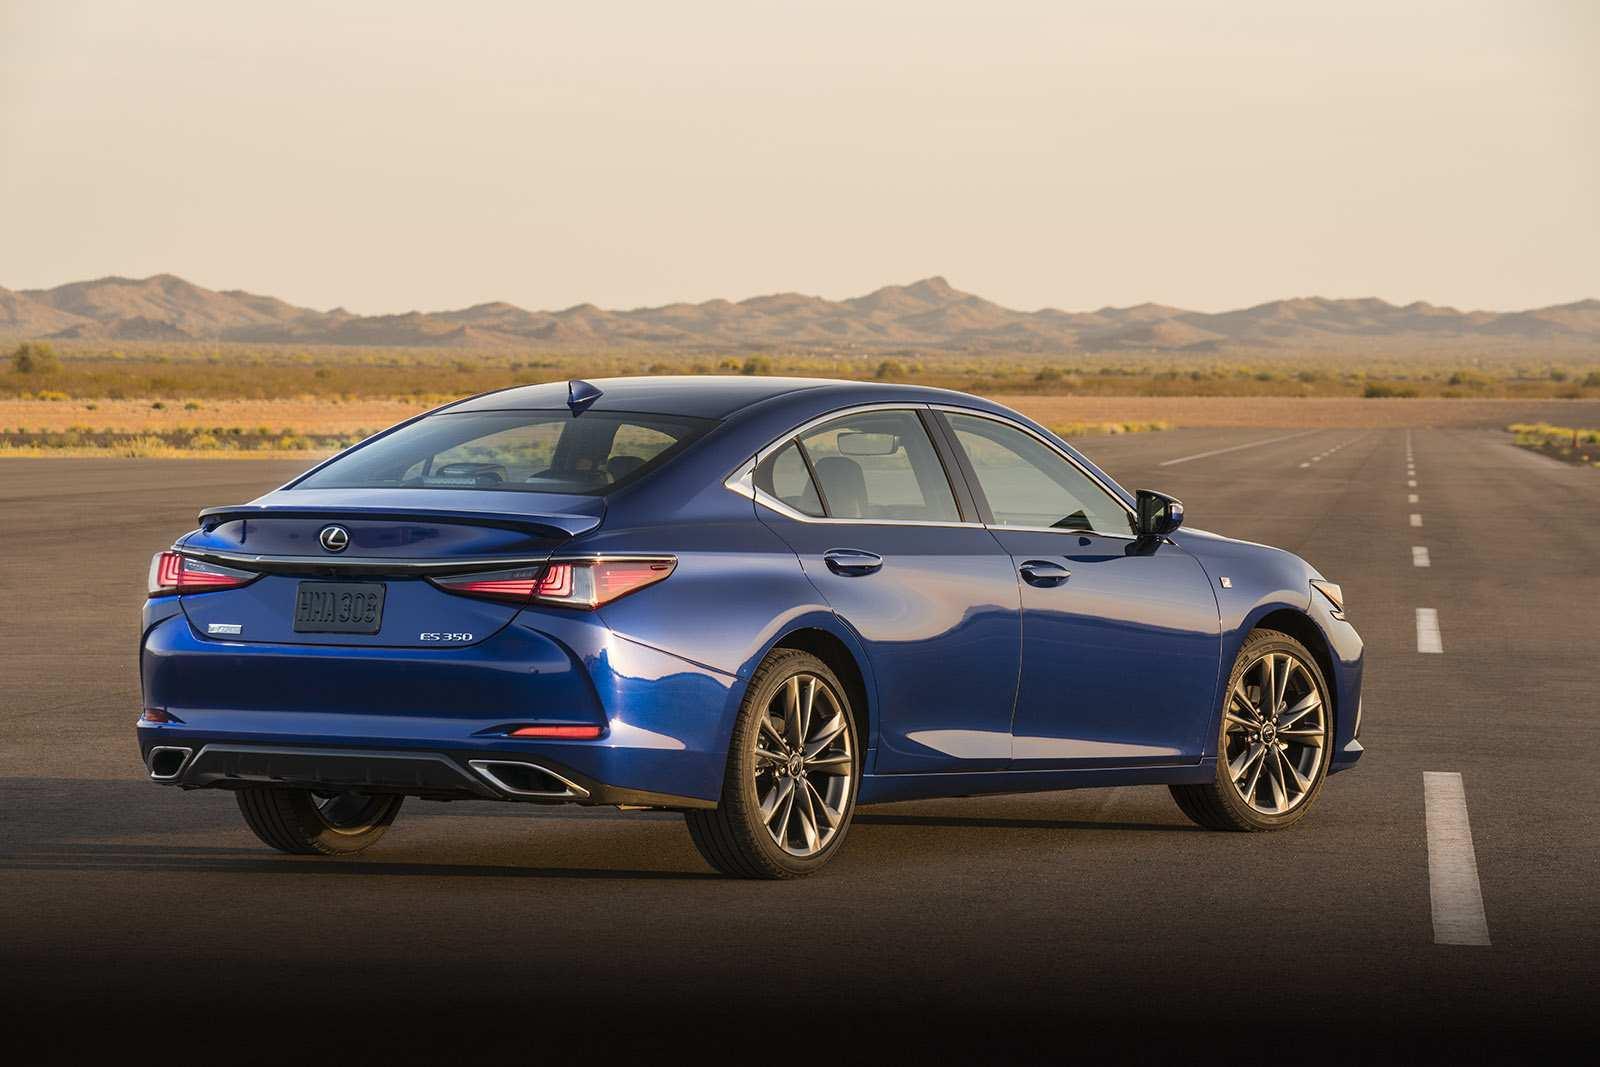 56 All New Lexus Es 2019 Debut Exterior and Interior by Lexus Es 2019 Debut